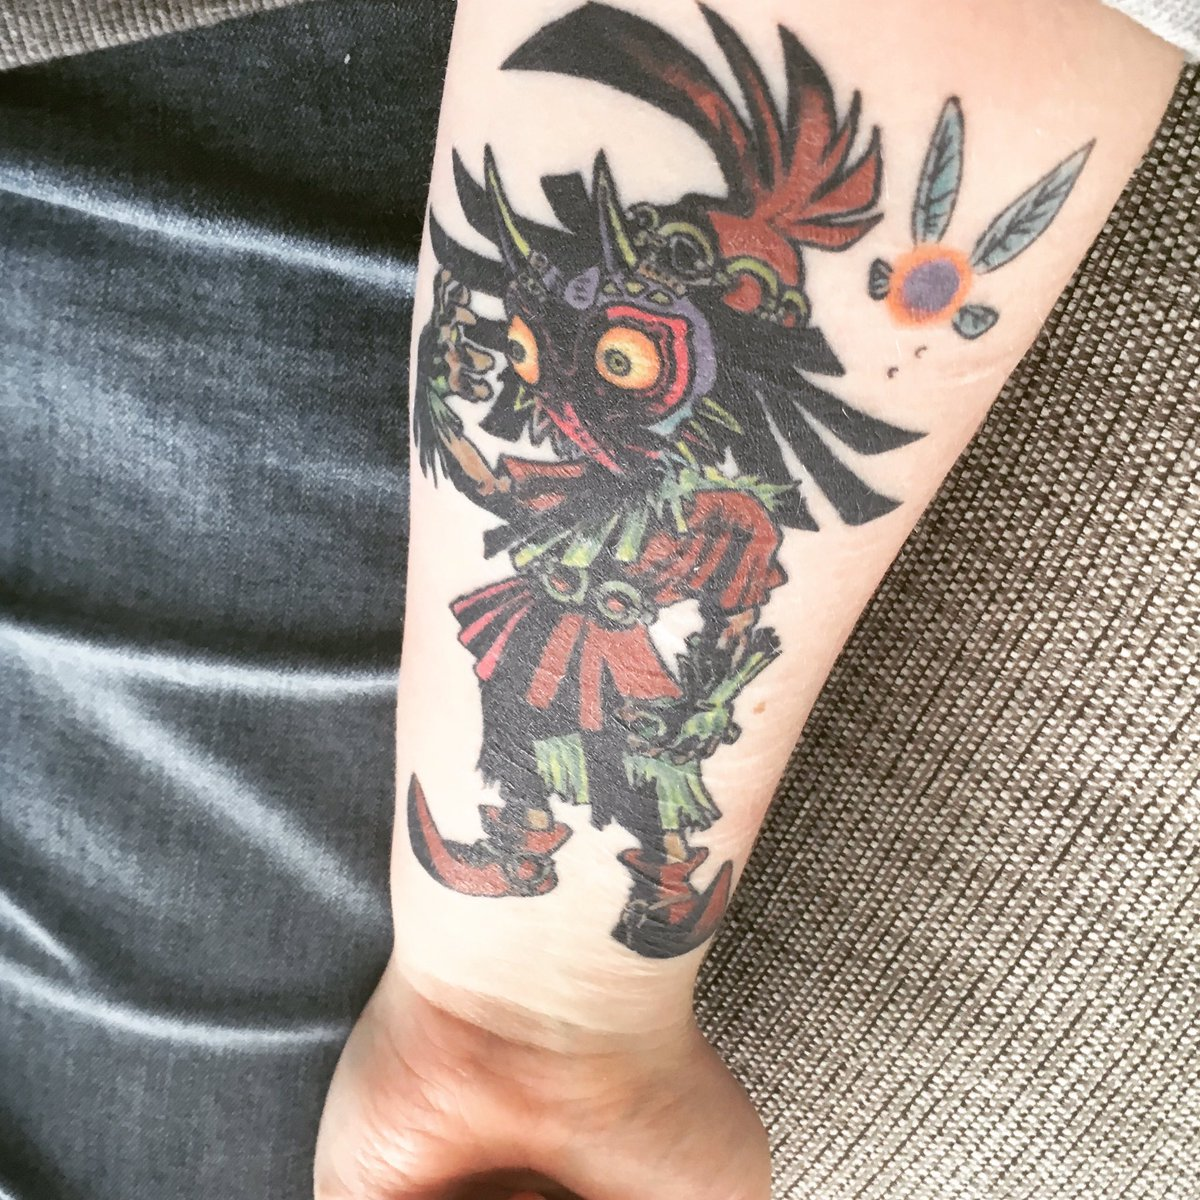 #Geek Awesome of the Day: Colorful #Nintendo #Zelda #MajorasMask + Navi Forearm #Tattoo via @II_Susan_II #SamaTattoo